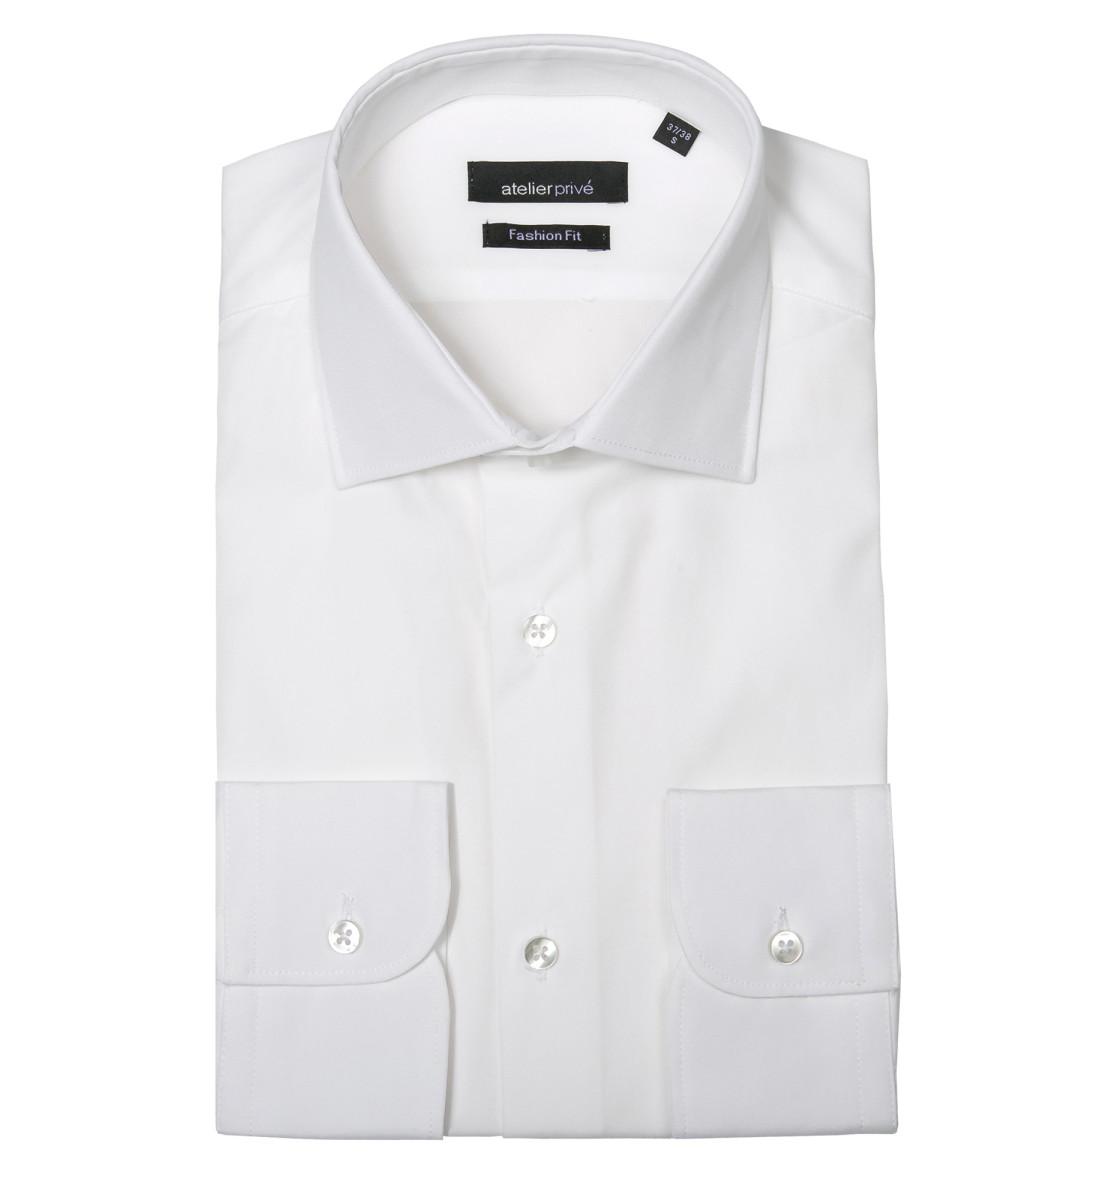 chemise coupe droite en popeline col italien blanc. Black Bedroom Furniture Sets. Home Design Ideas